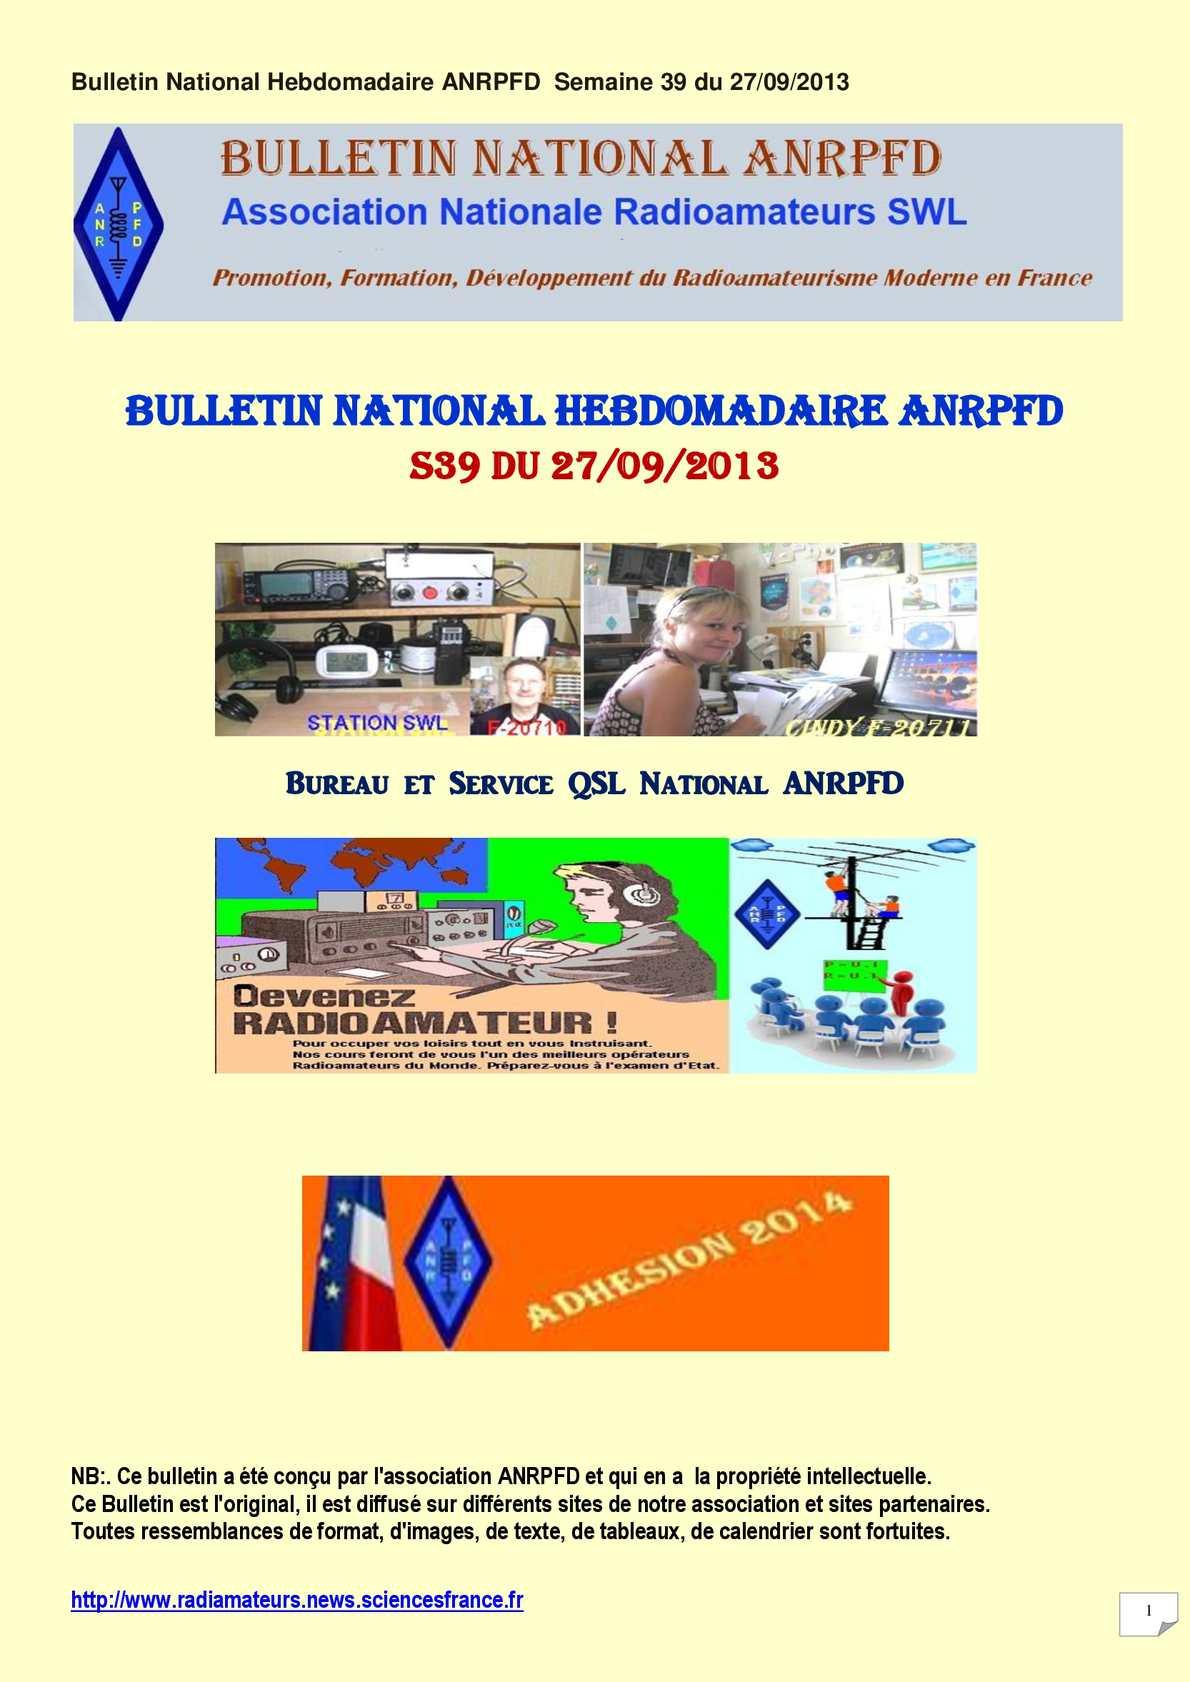 Bulletin-National-Hebdo-ANRPFD-S39-2013